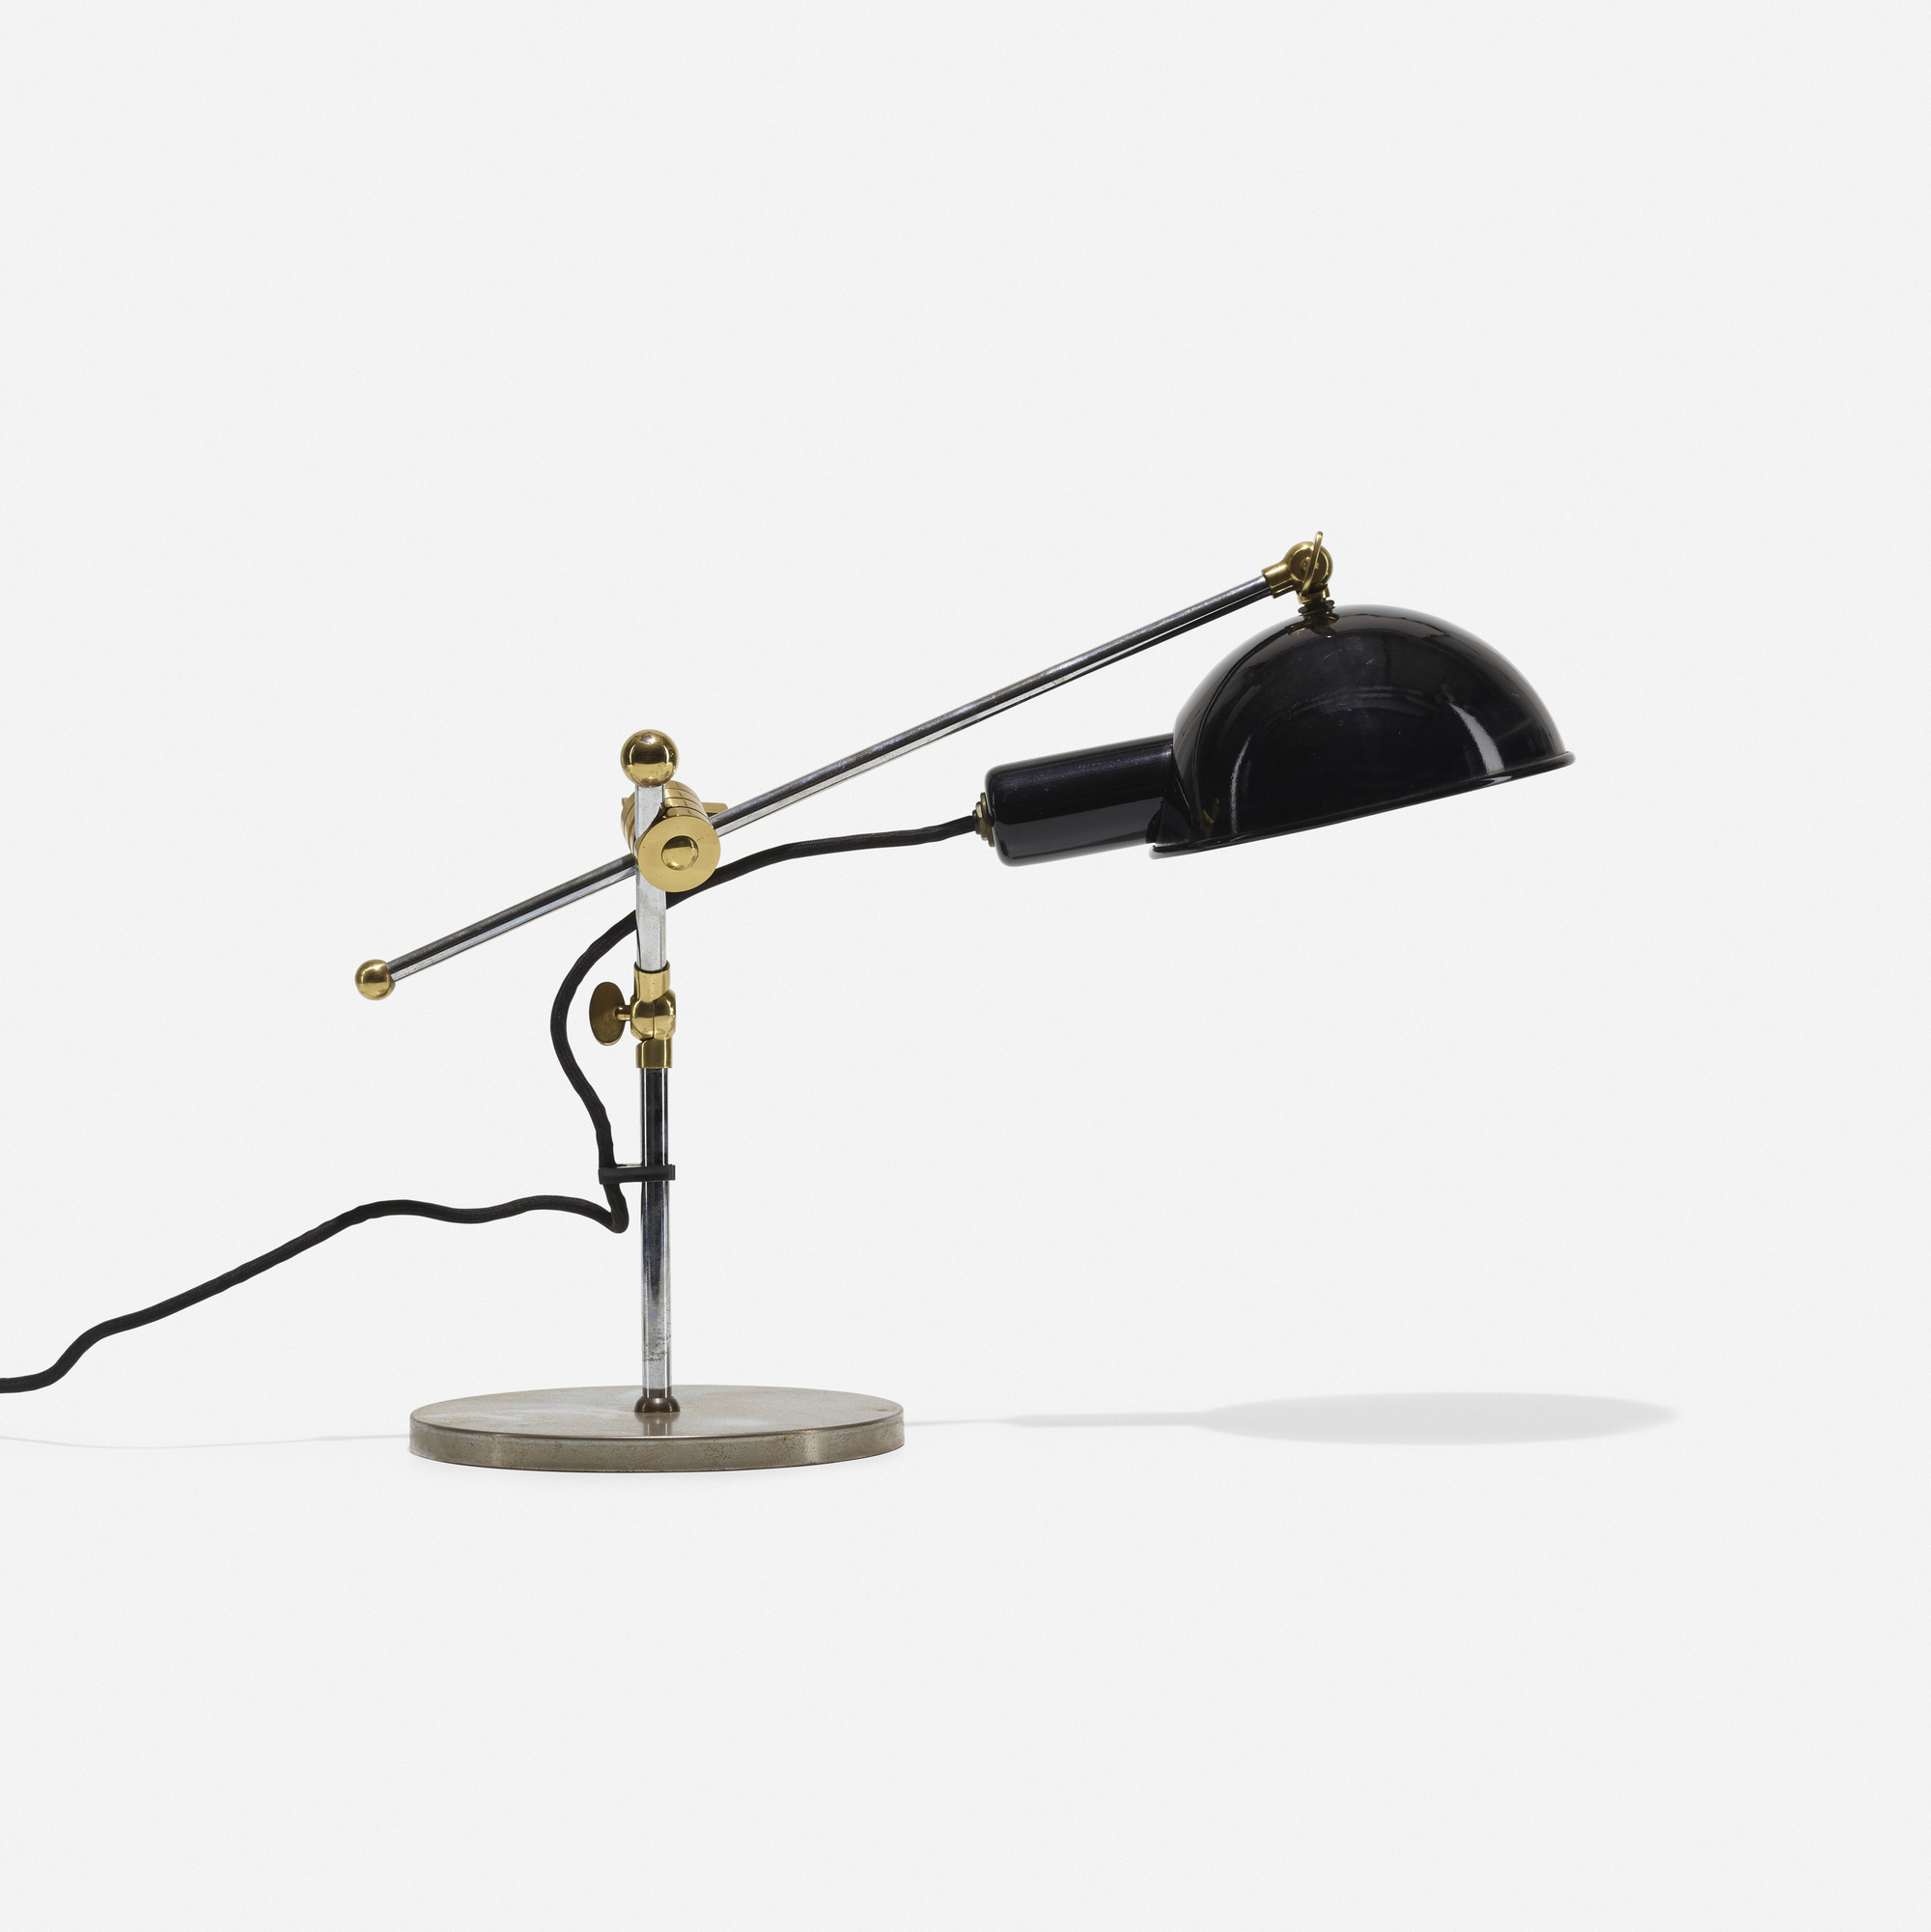 359: Walter Schnepel / adjustable desk lamp, model SF 27 (1 of 3)